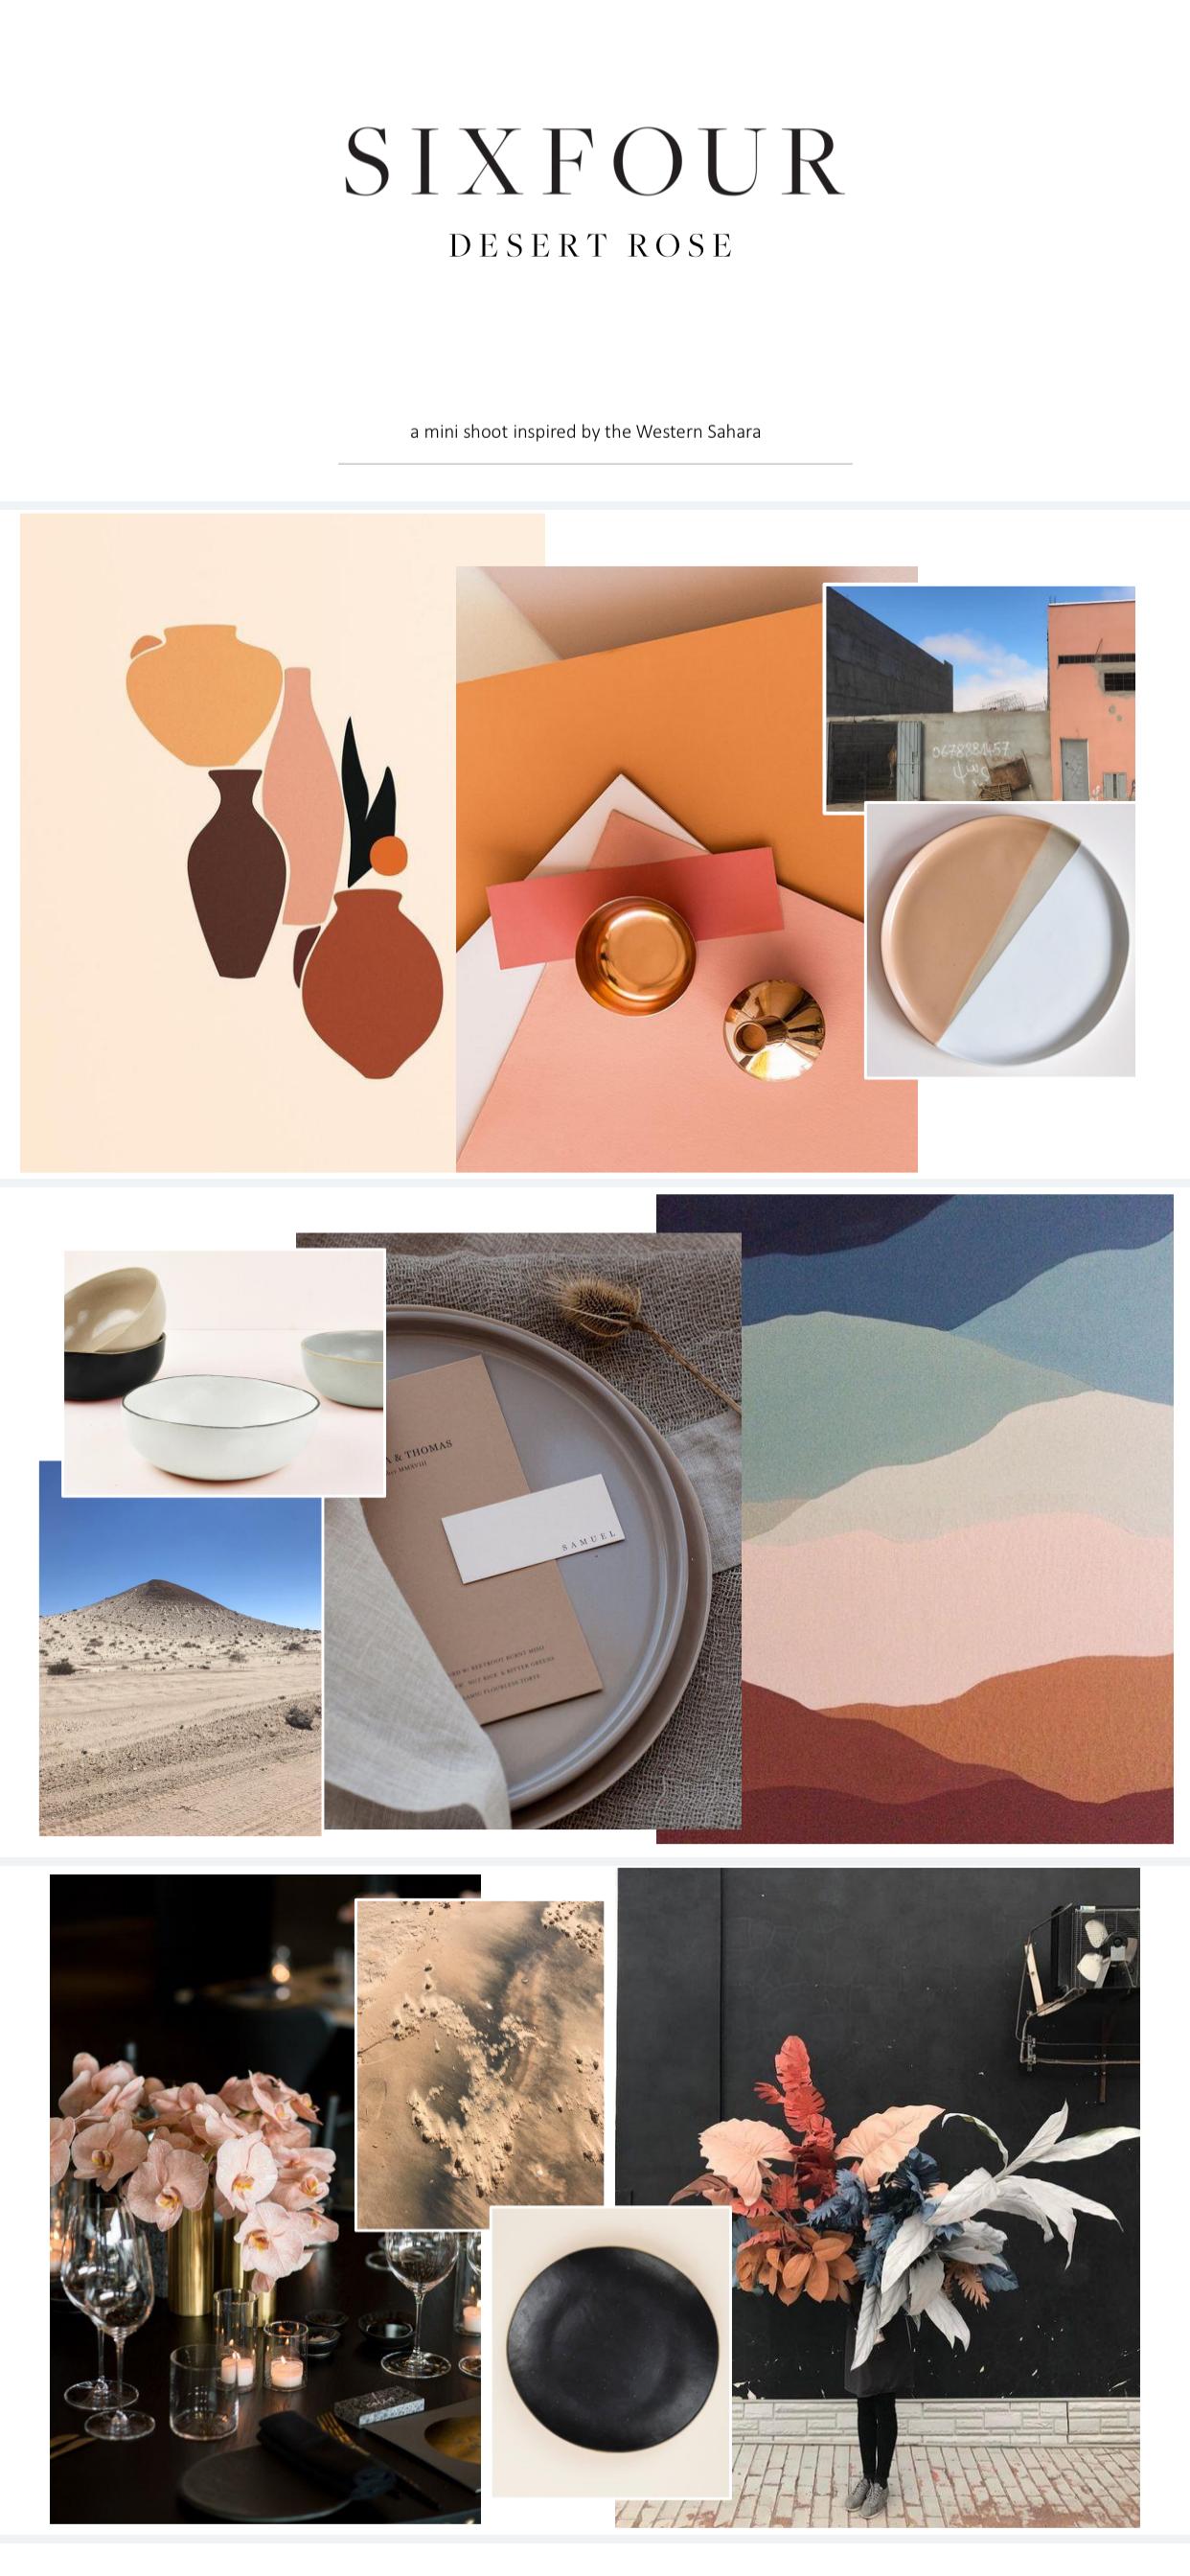 Desert Rose Moodboard by SIXFOUR